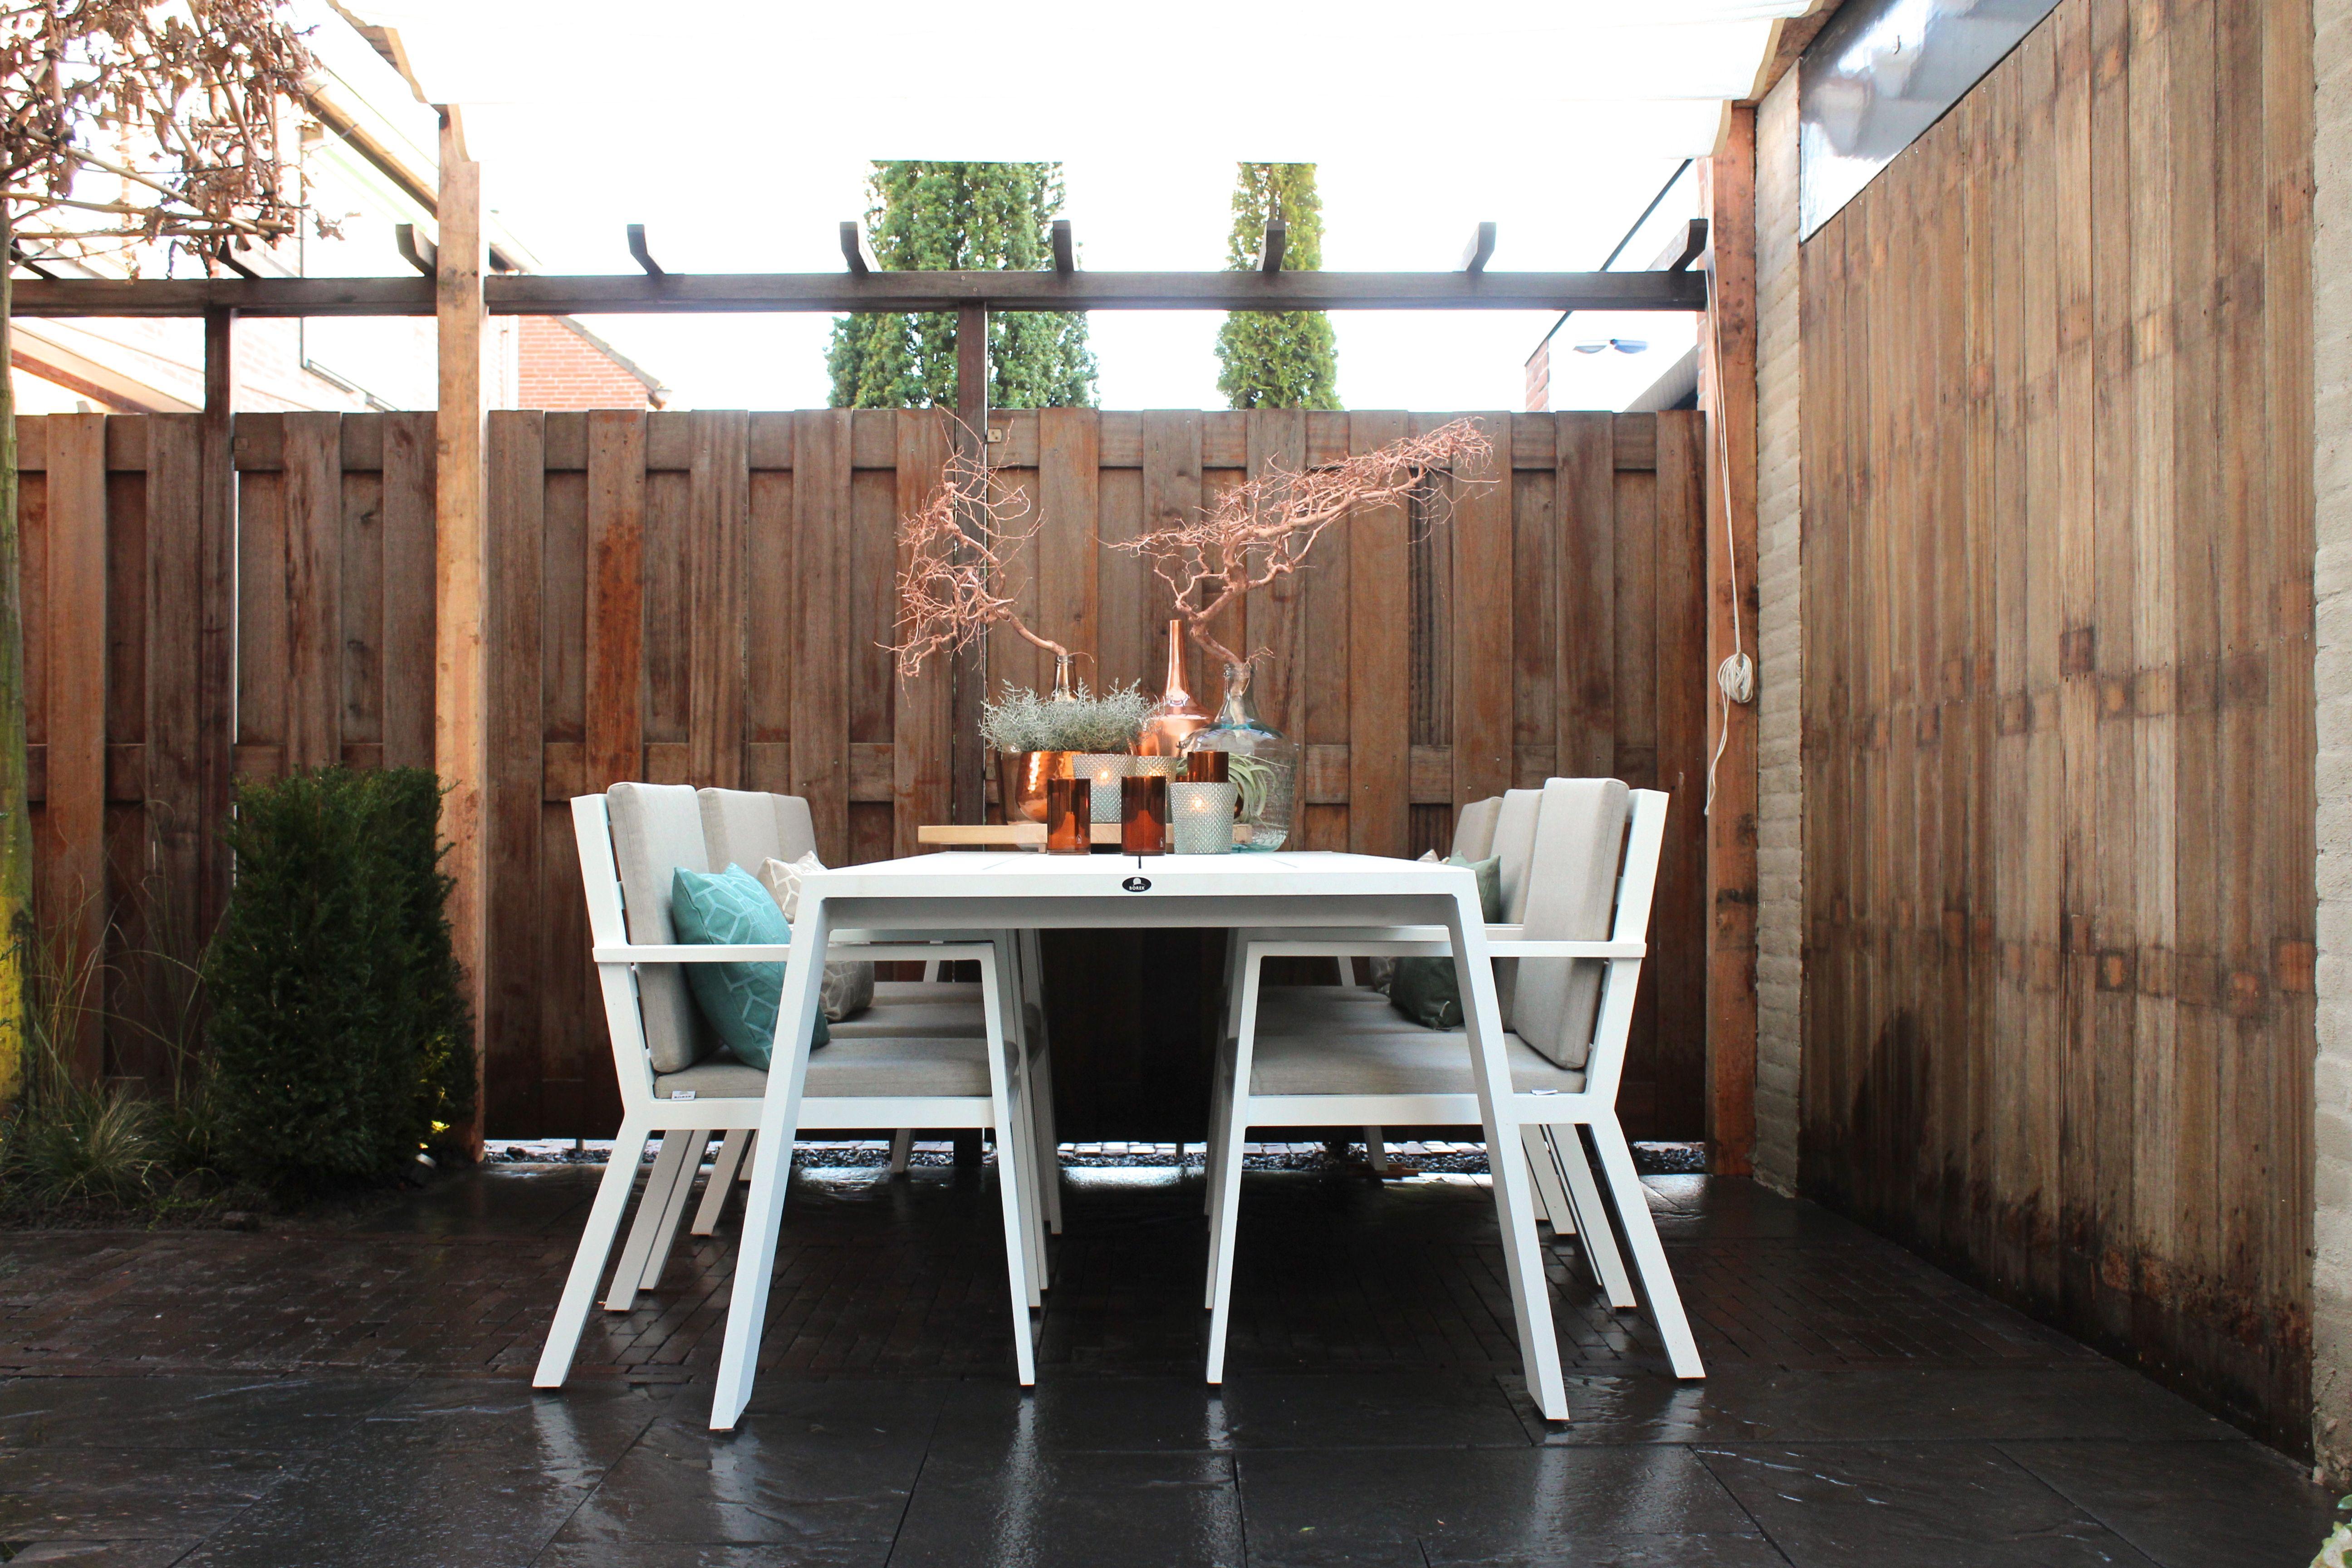 Eigen huis en tuin praxis maak je eigen hoekje in de for Huis in de tuin